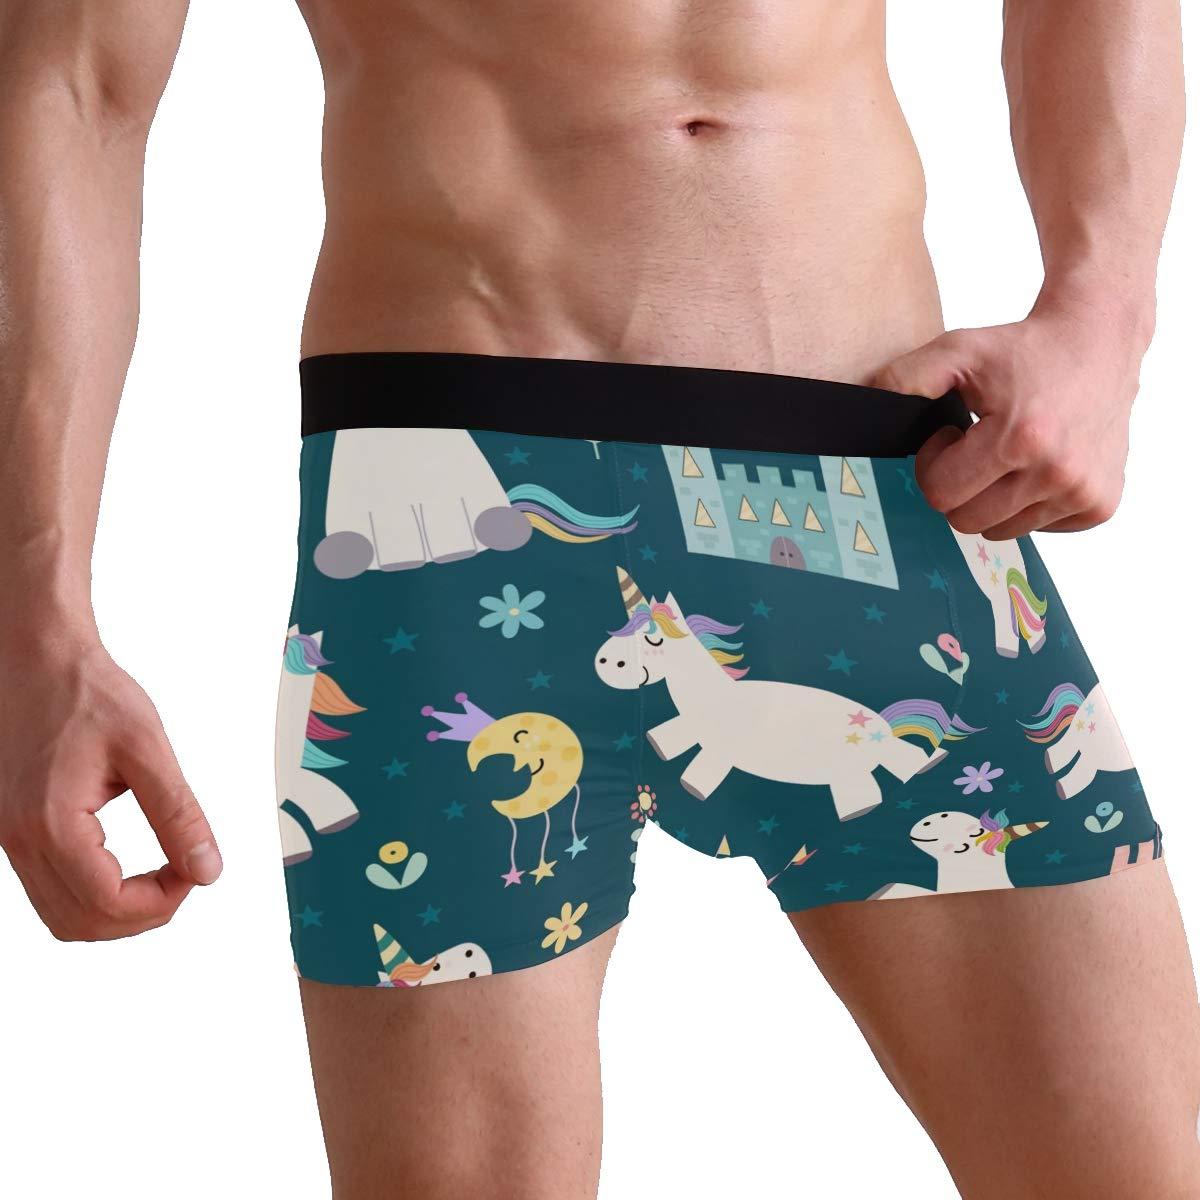 Men Boxer Briefs Polyester Underwear Men 2 Pack Boxer Briefs with Cute Little Unicorn Pattern